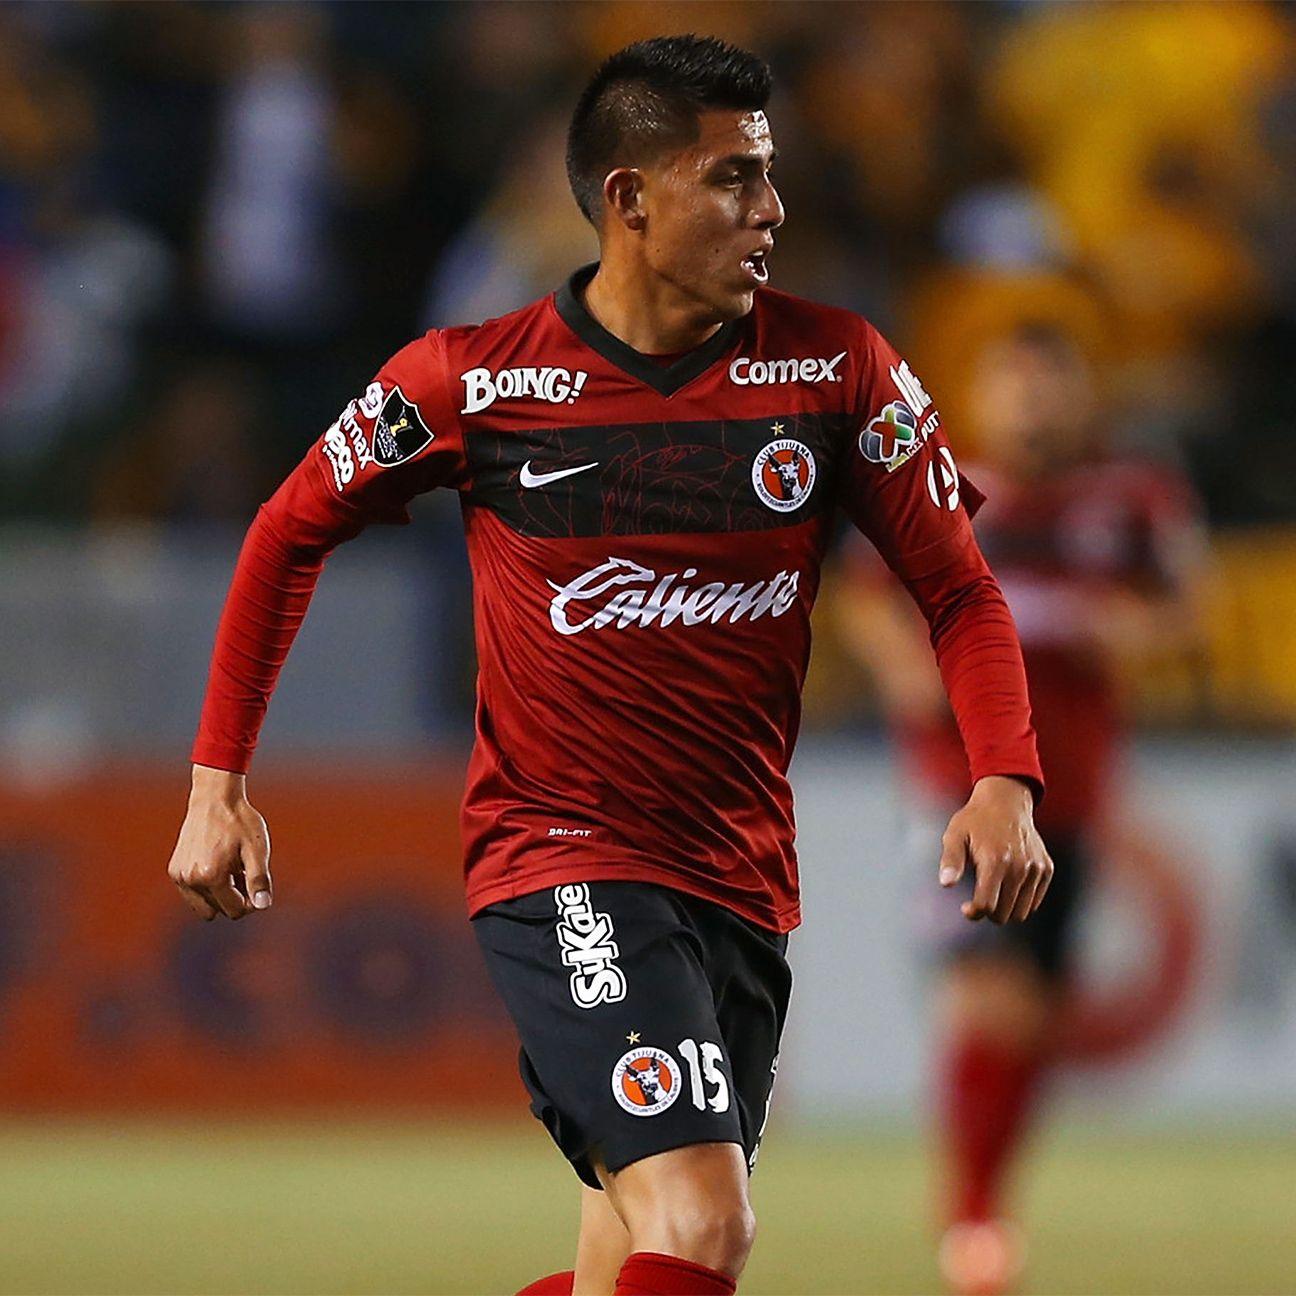 Sources: LA Galaxy to sign U.S. midfielder Joe Corona from Tijuana